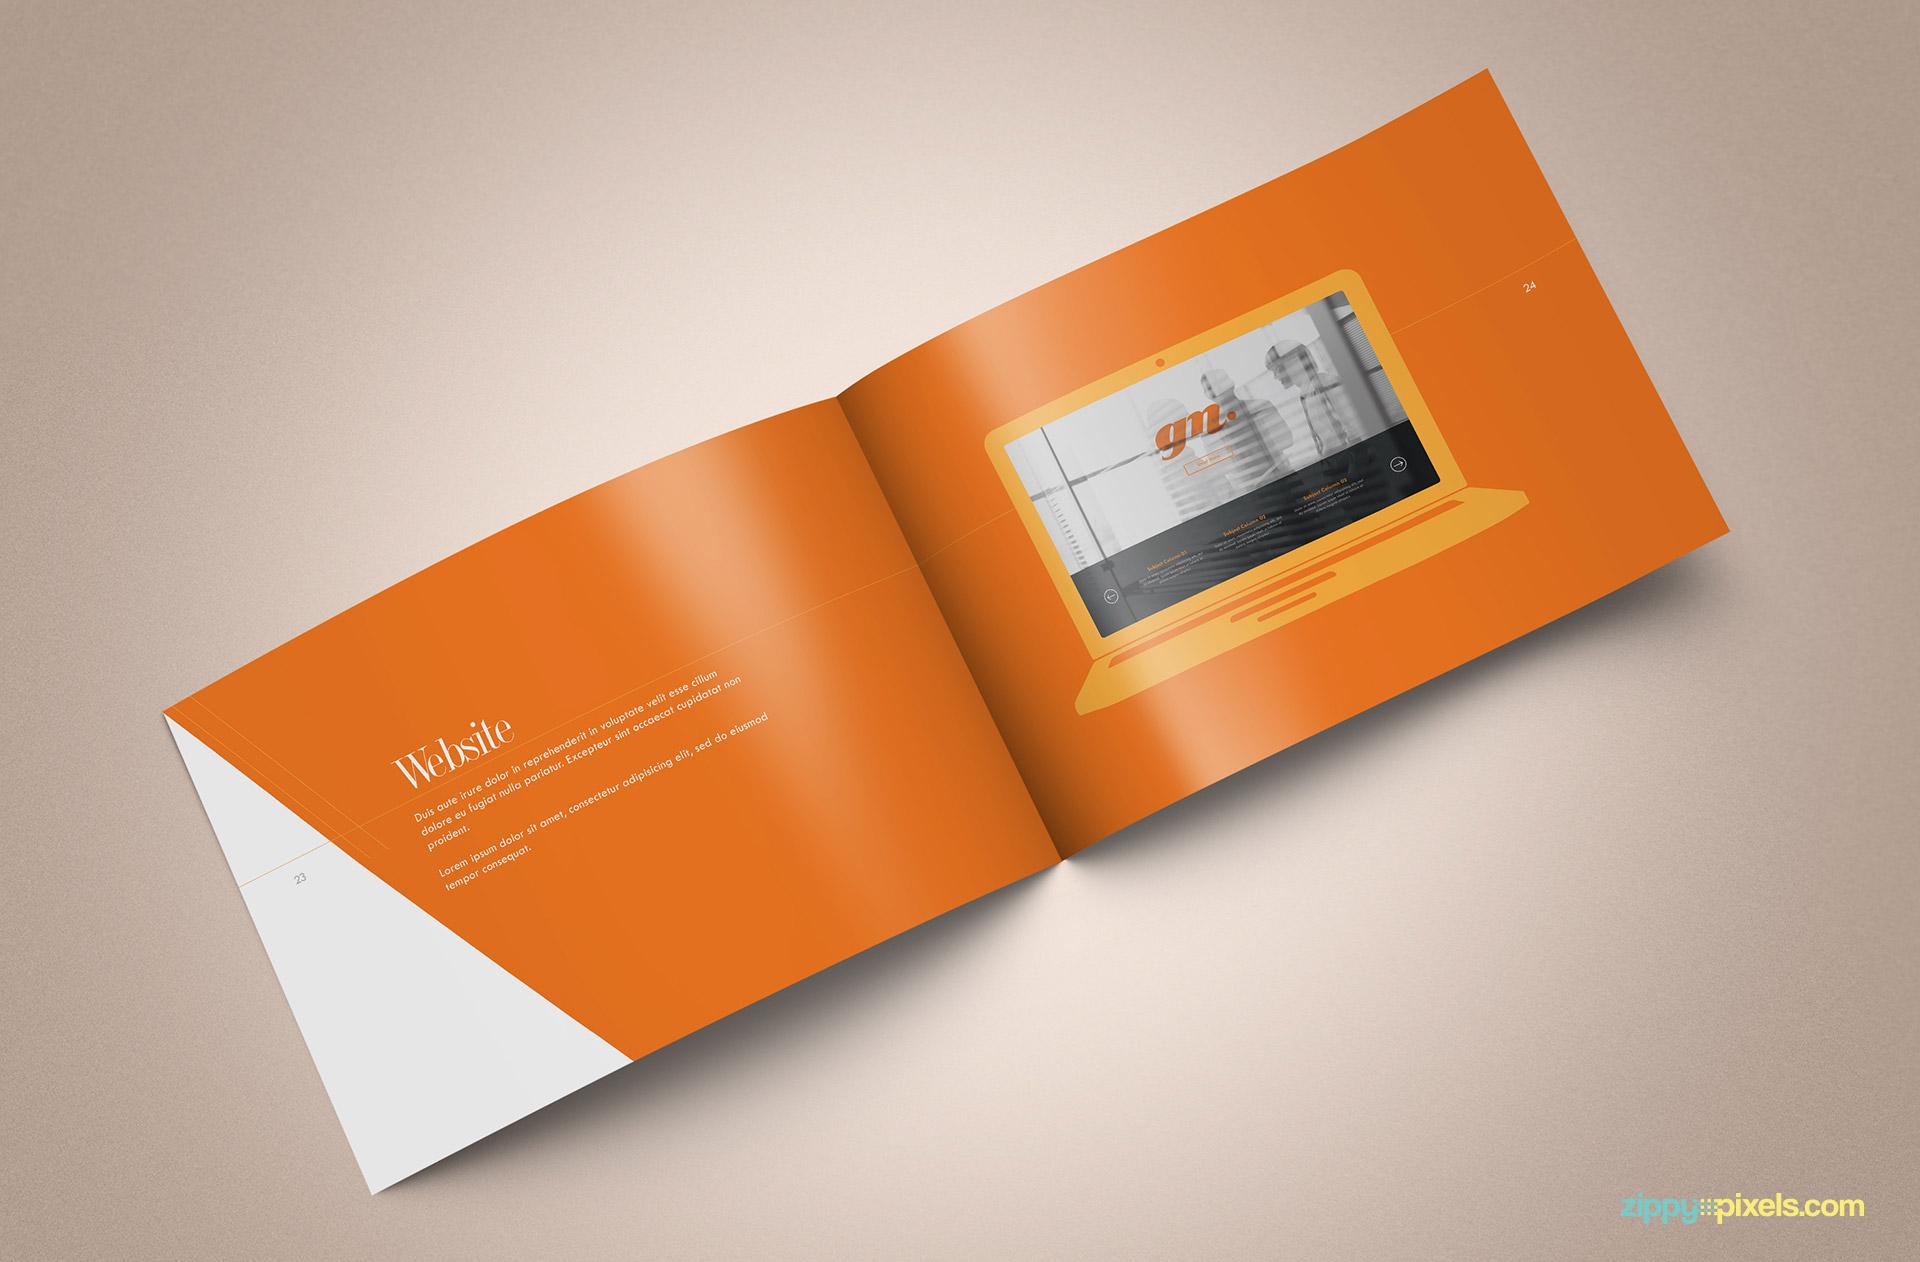 15-brand-book-4-website